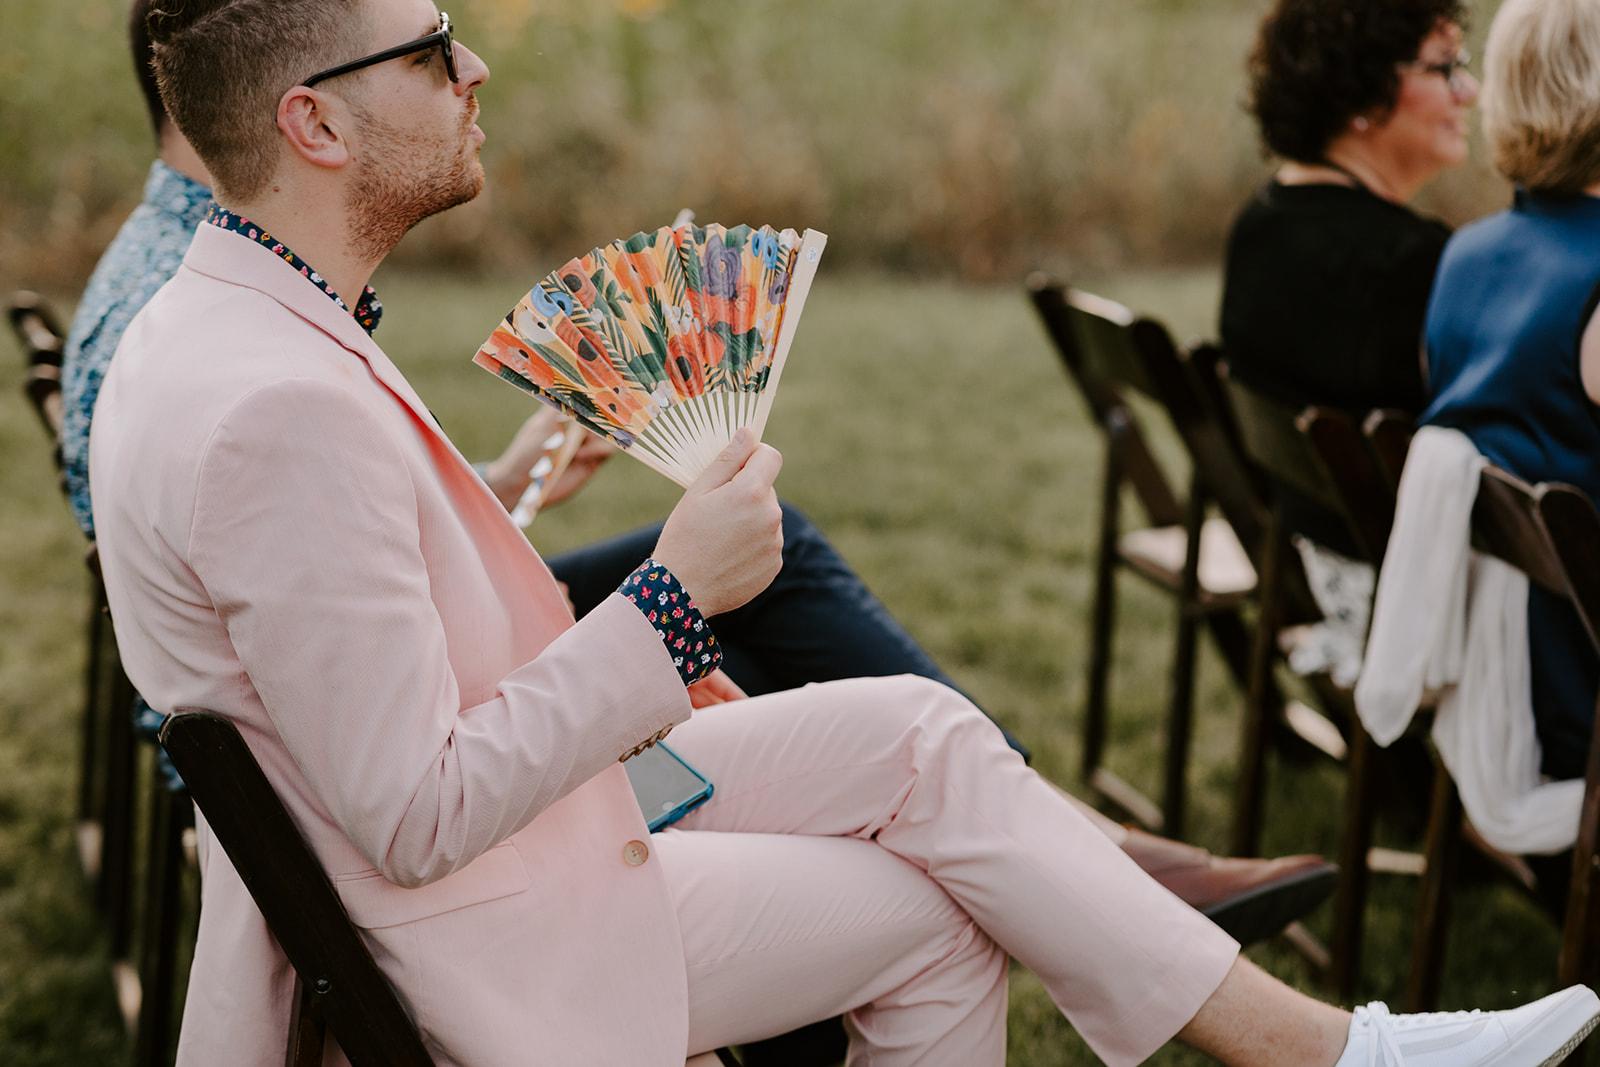 Wedding fans for outdoor summer wedding